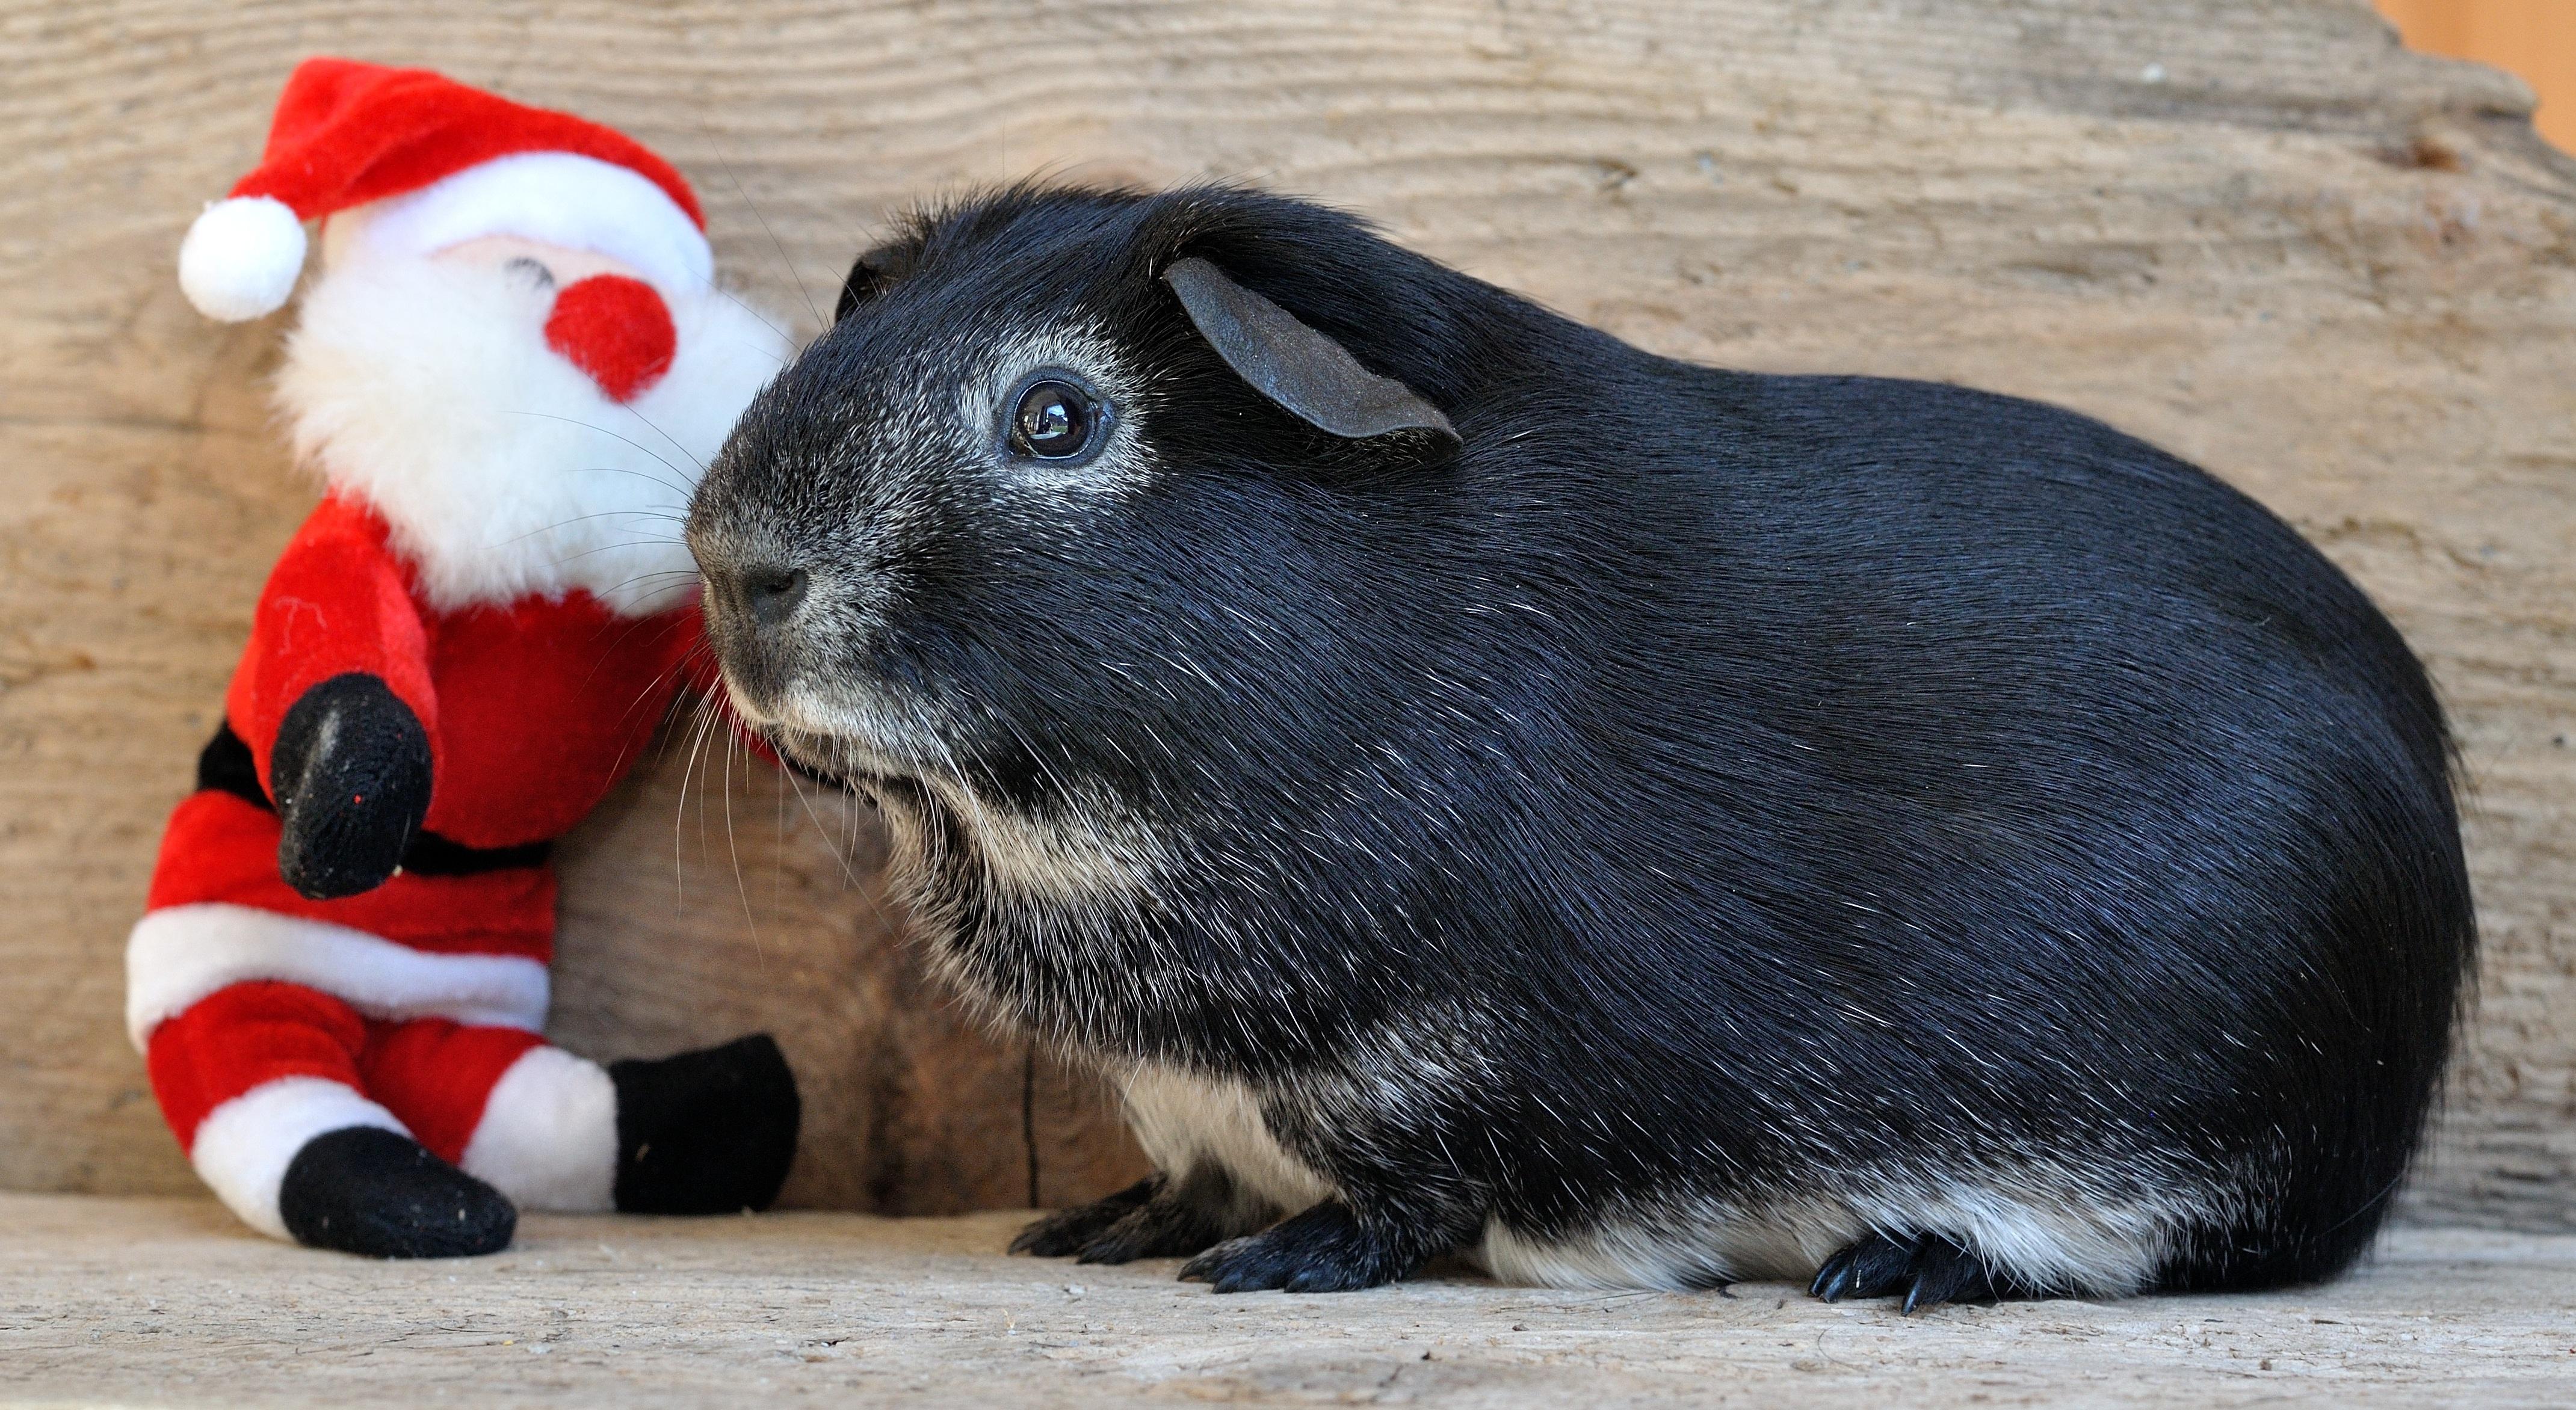 Black Guinea, Adorable, Animal, Cute, Friend, HQ Photo